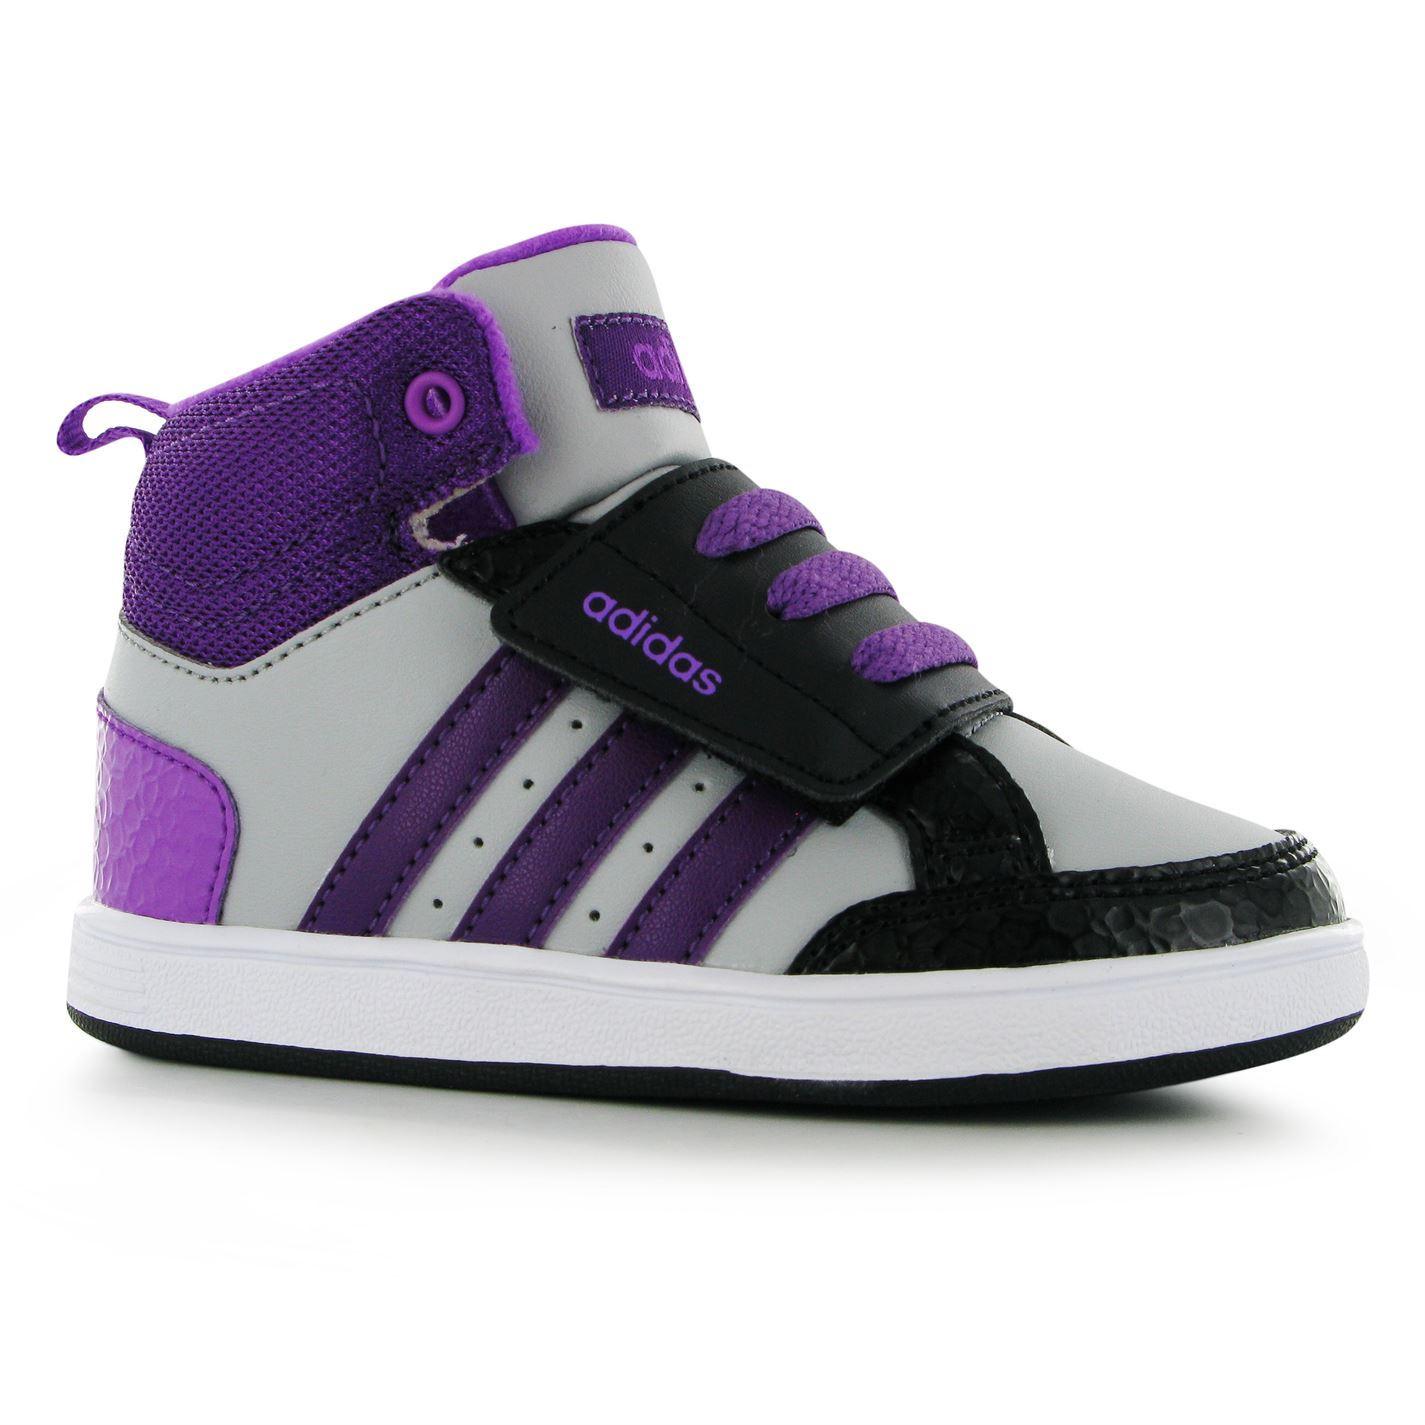 Adidas Hoops Mid Trainers Infant Girls ix Purple Black